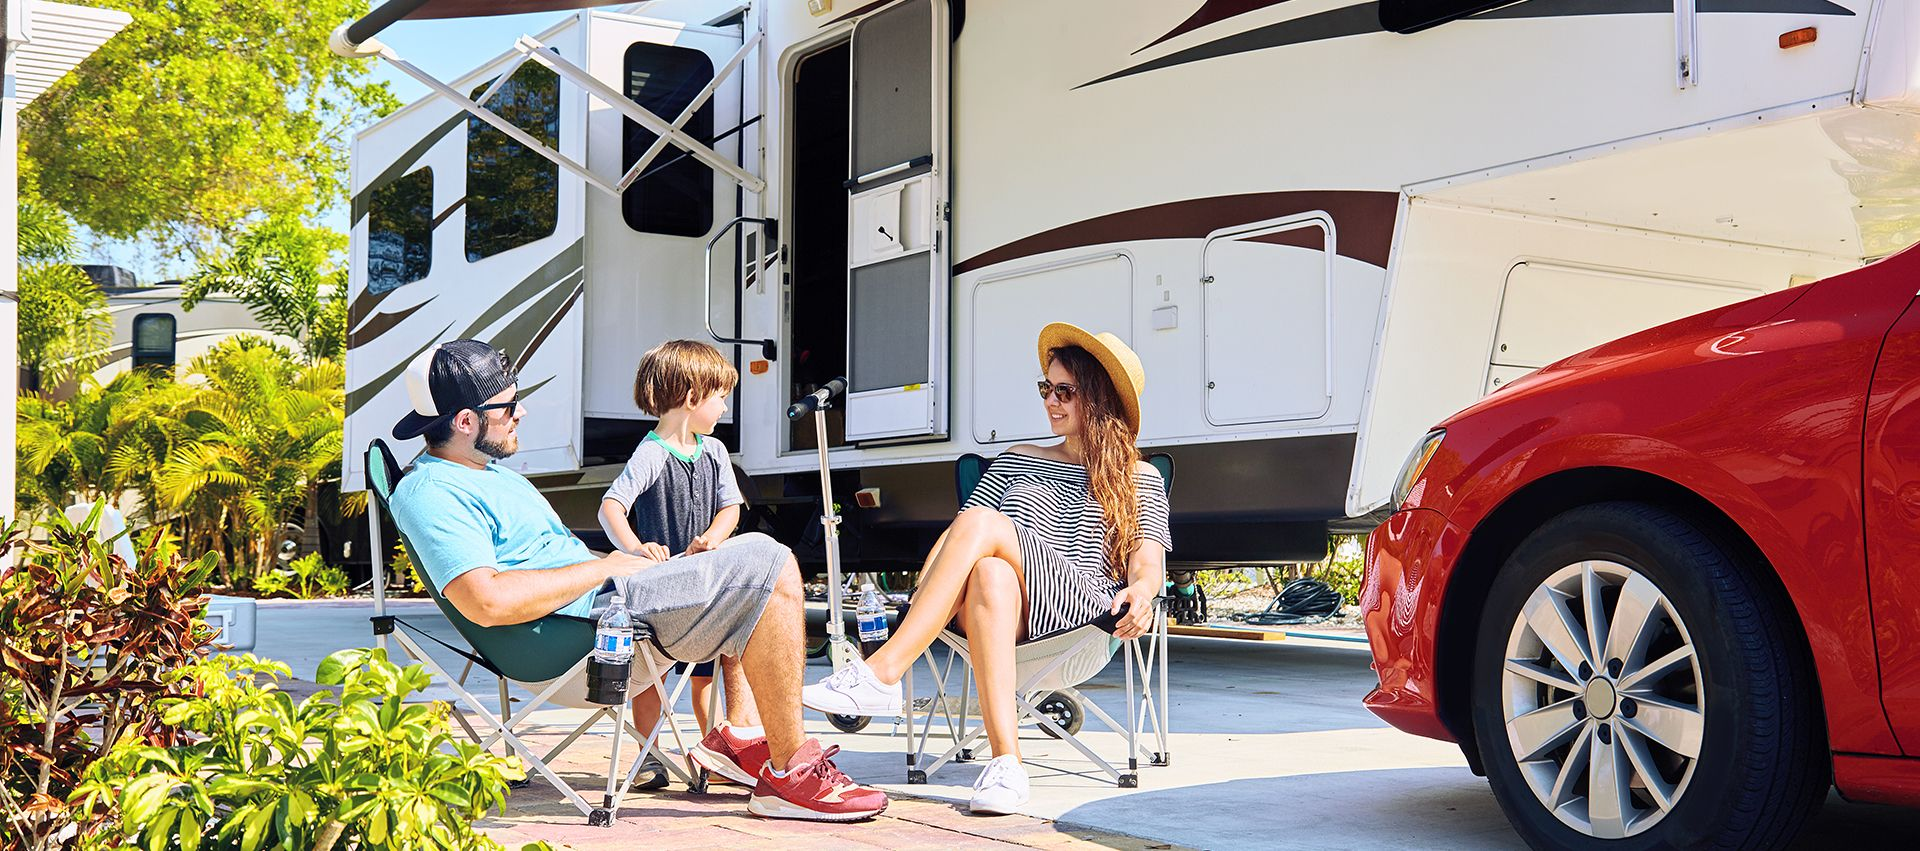 Family enjoying a rented RV